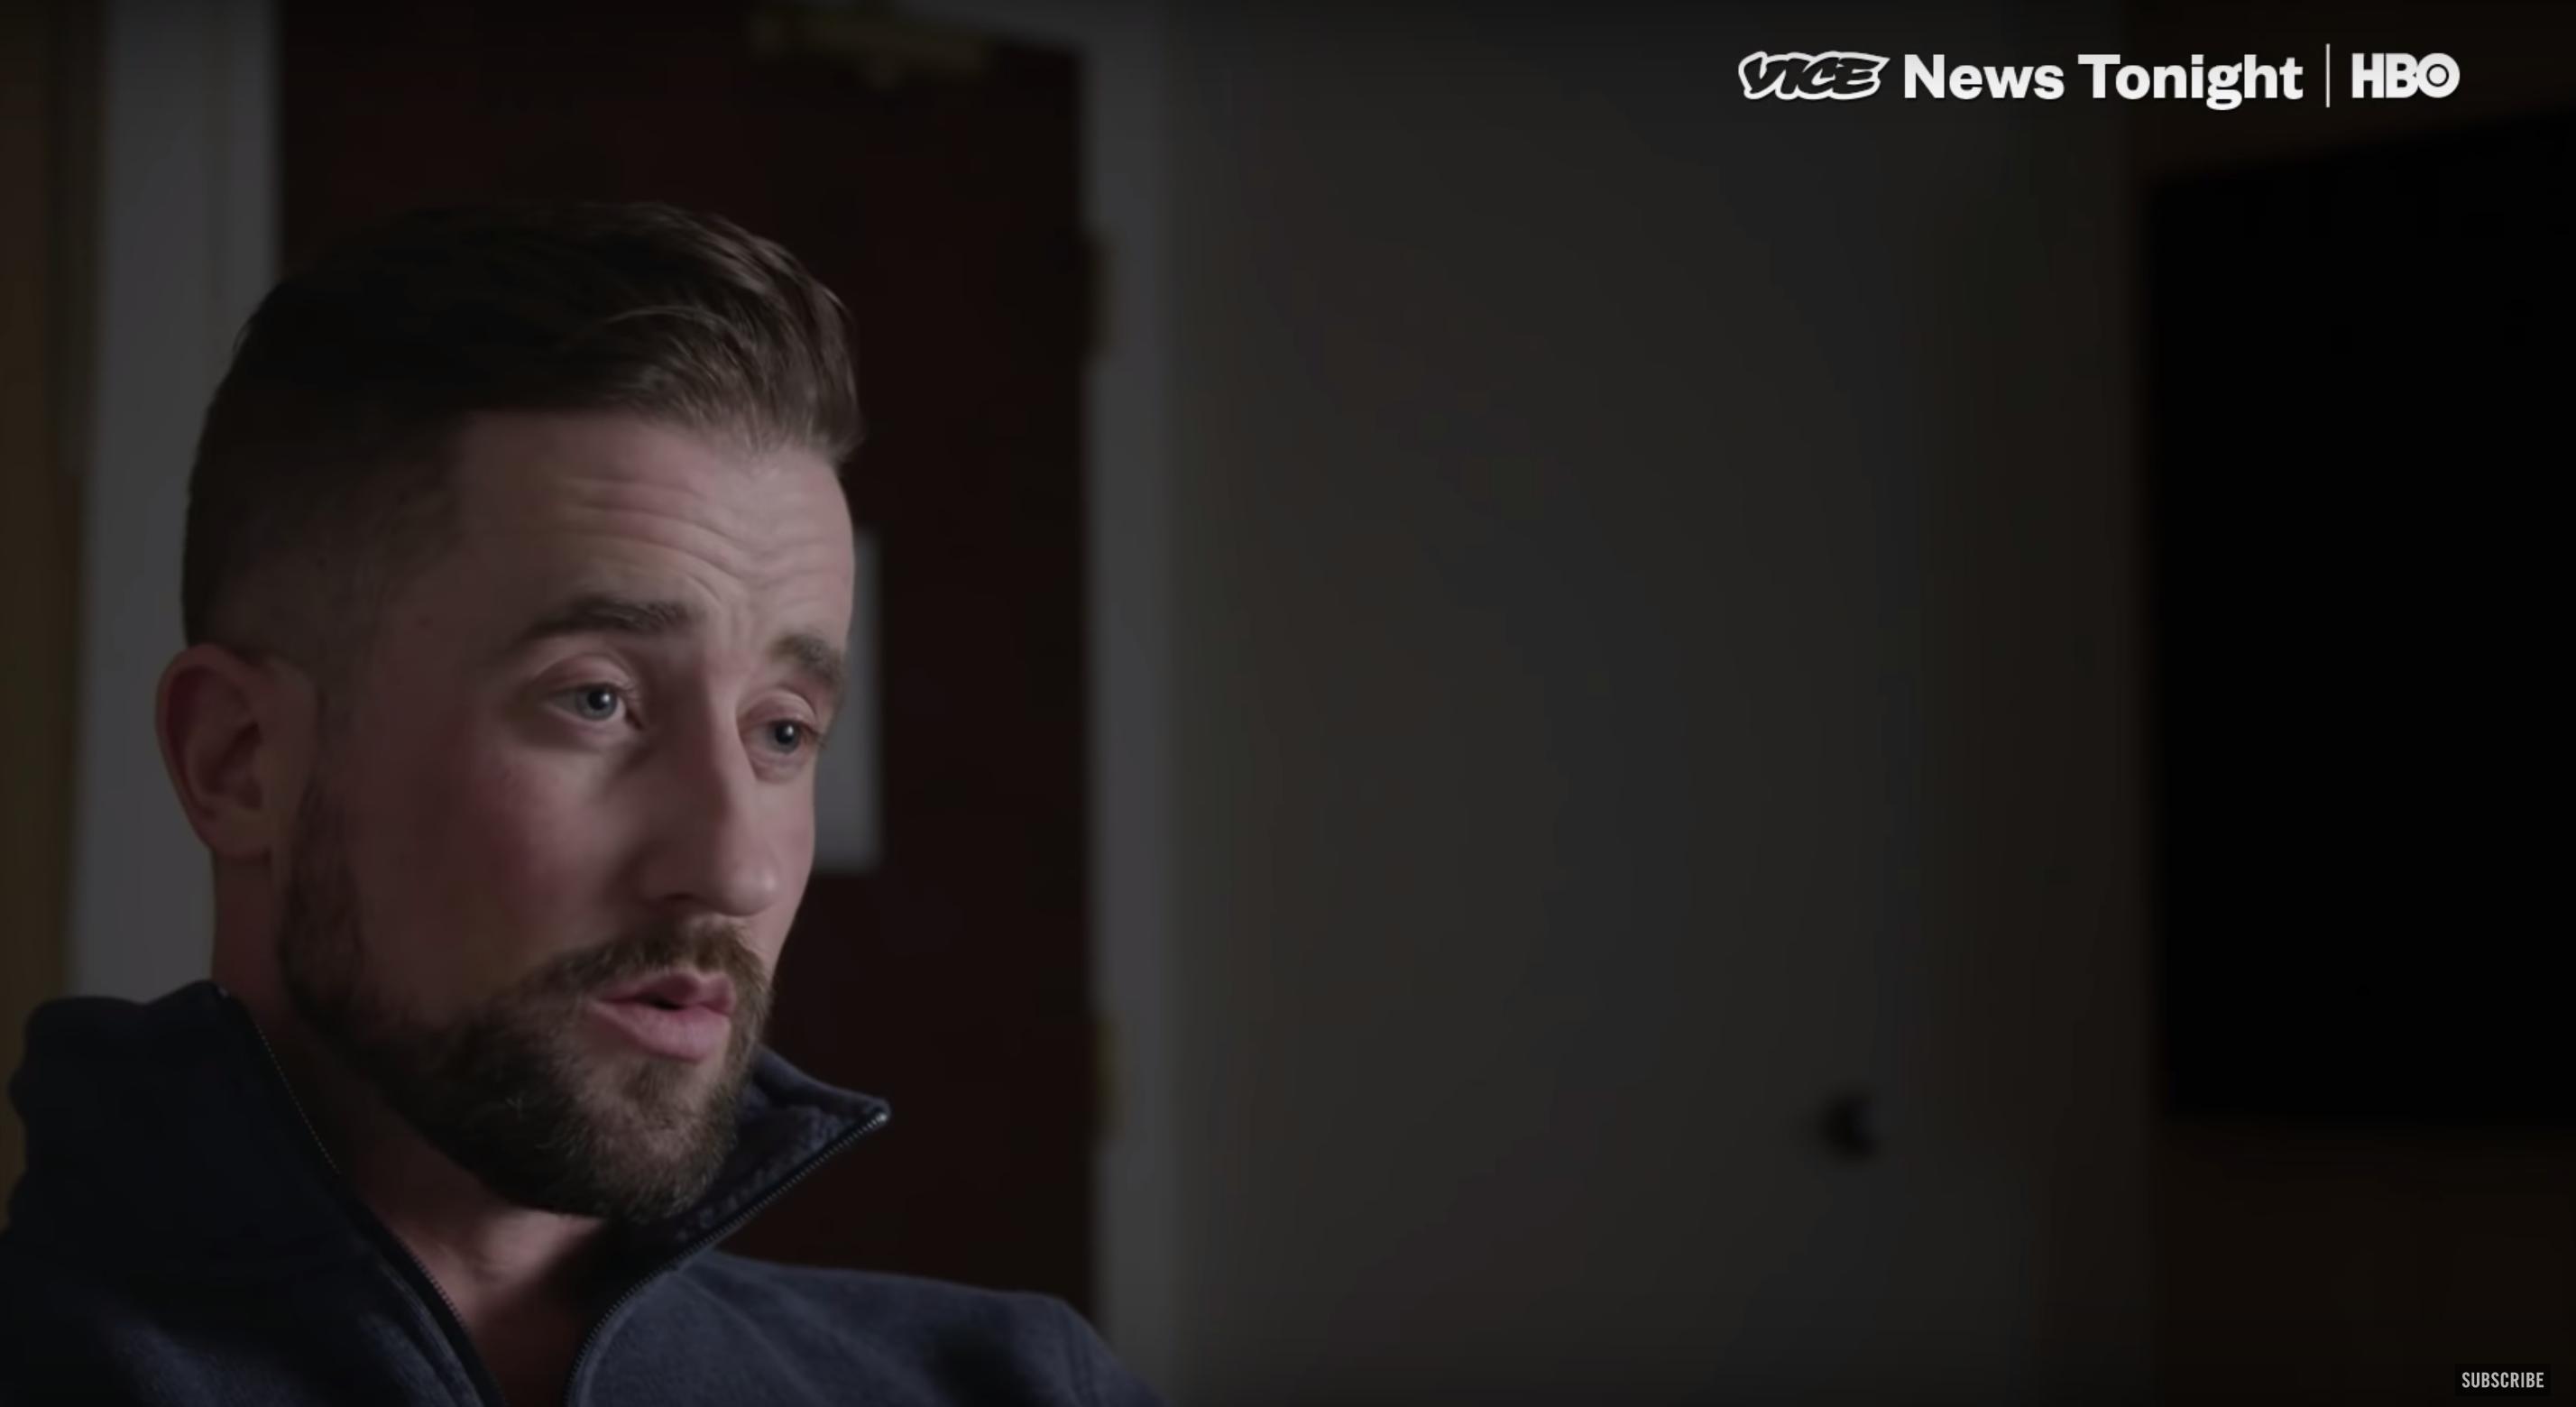 Columbine survivor and addiction advocate Austin Eubanks found dead in his home